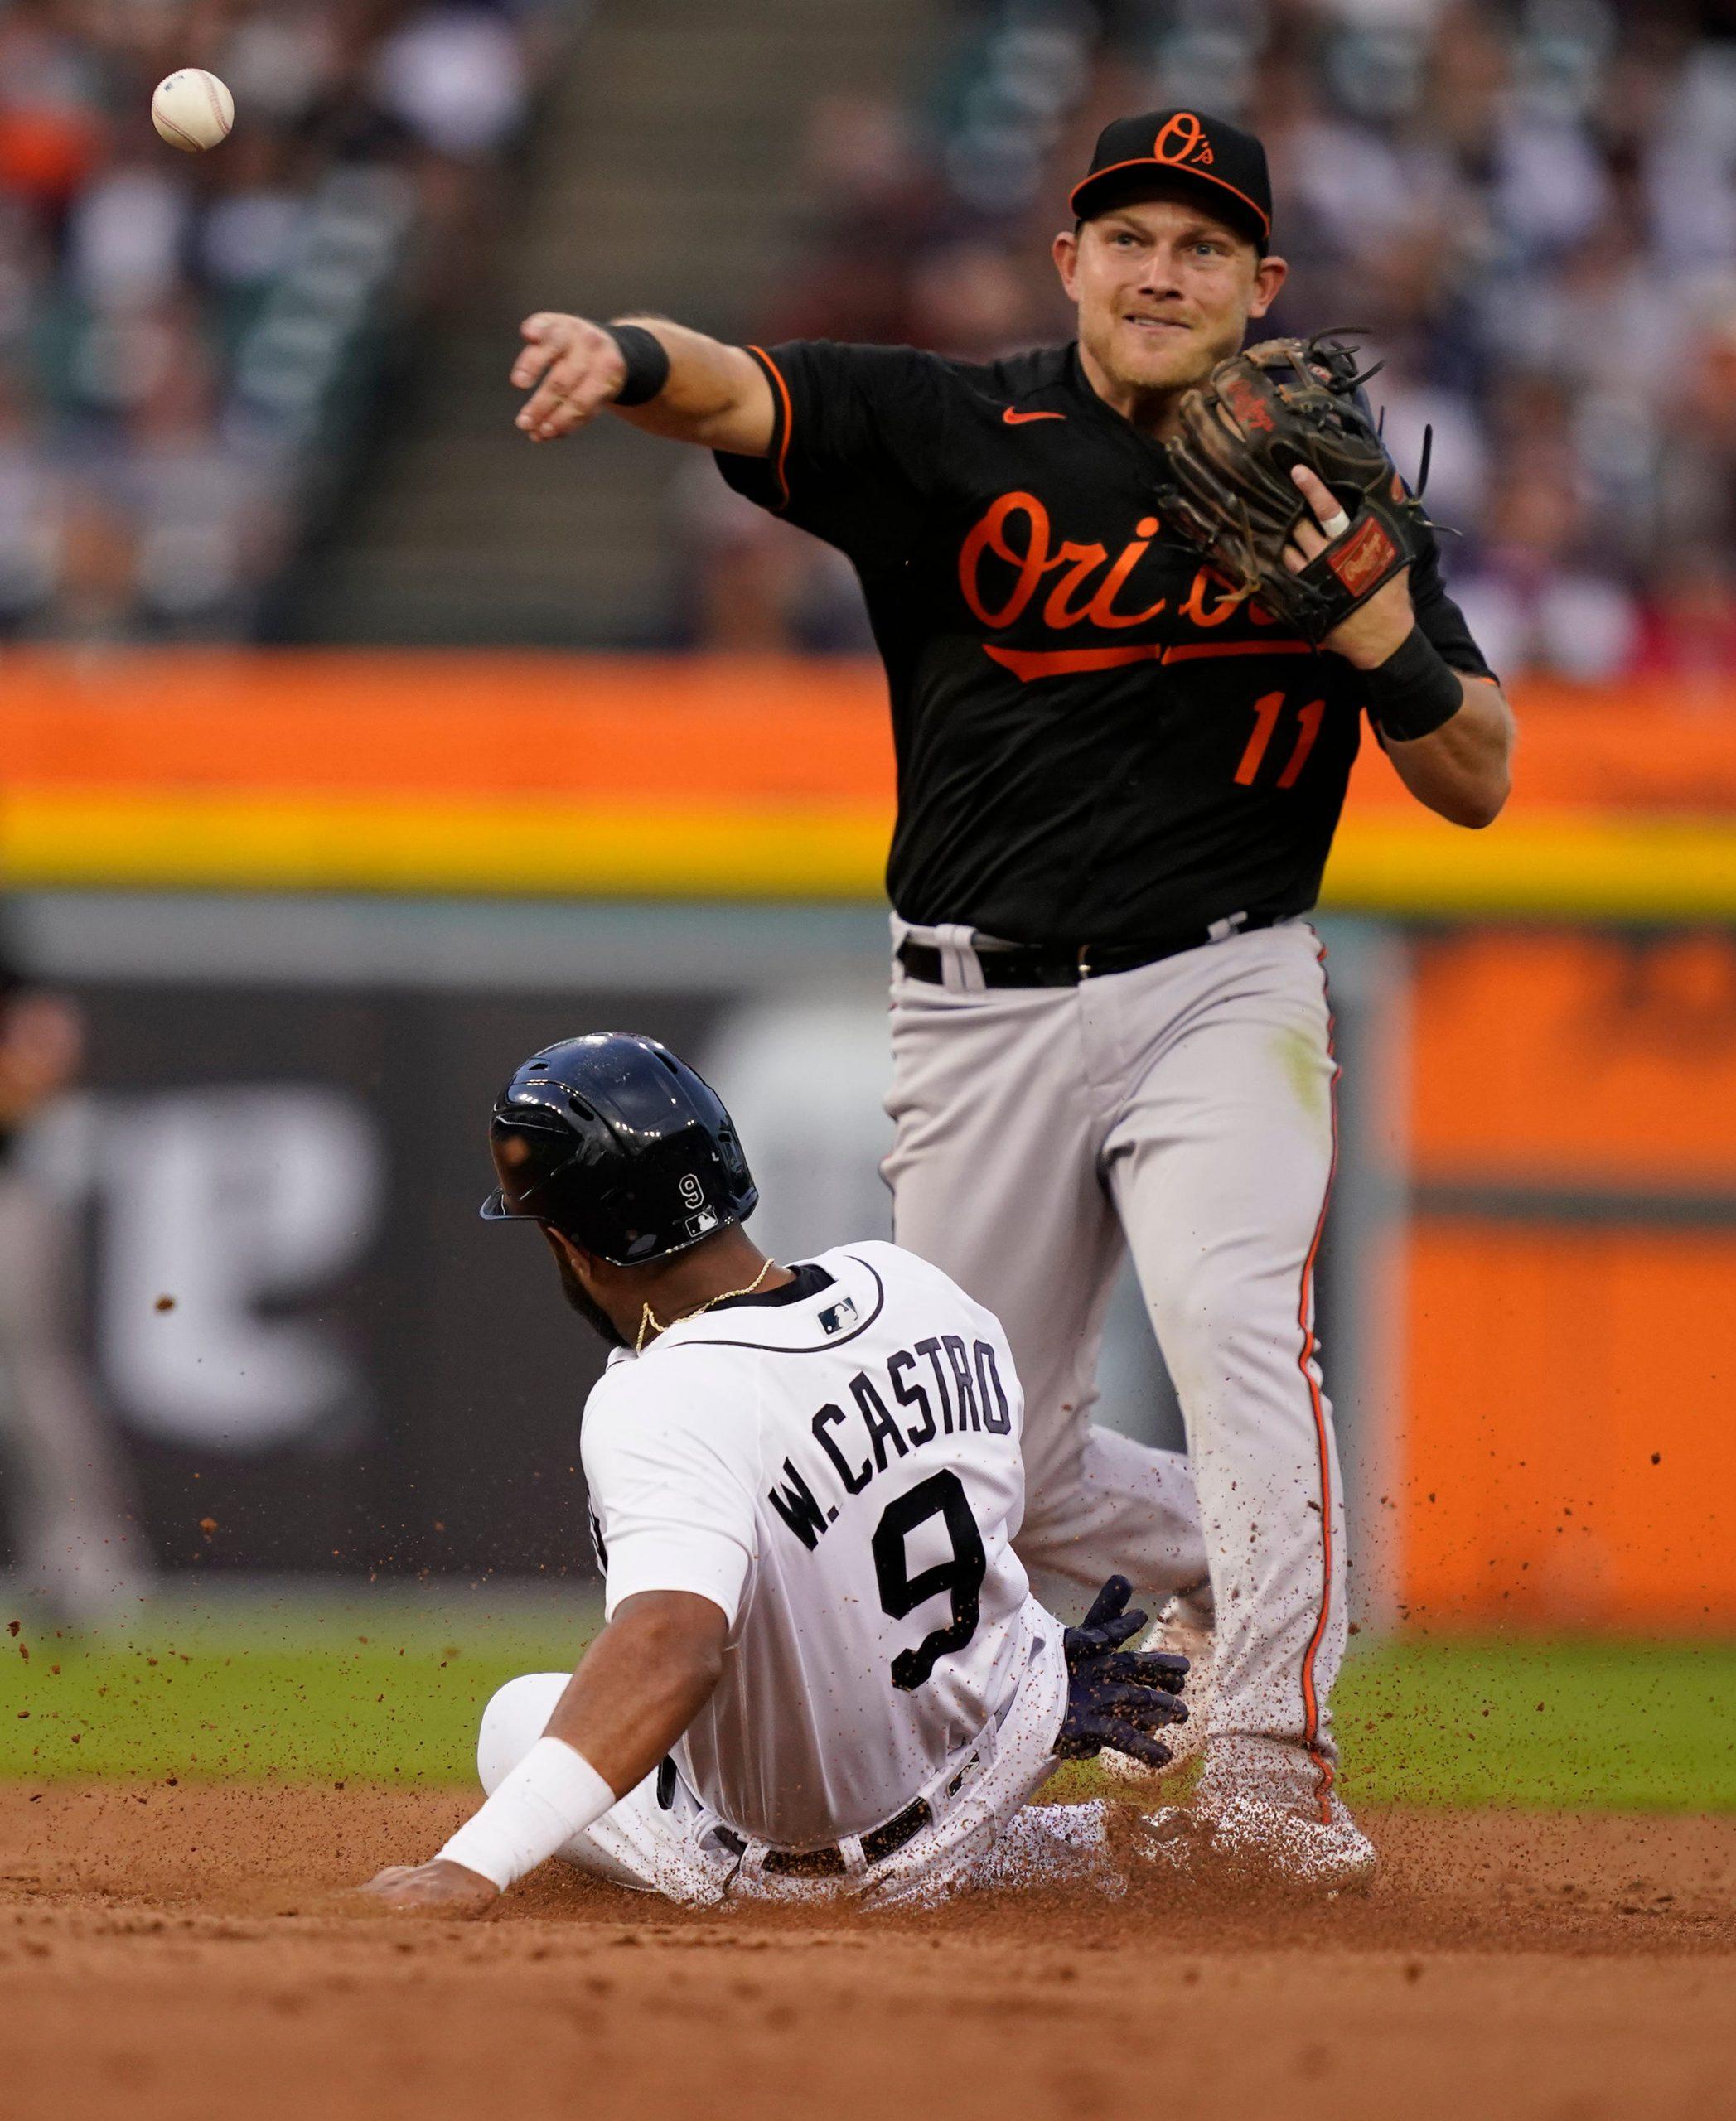 75e71ed1-5996-4b01-ac7c-976e5bd50f23-AP_Orioles_Tigers_Baseball_M_1